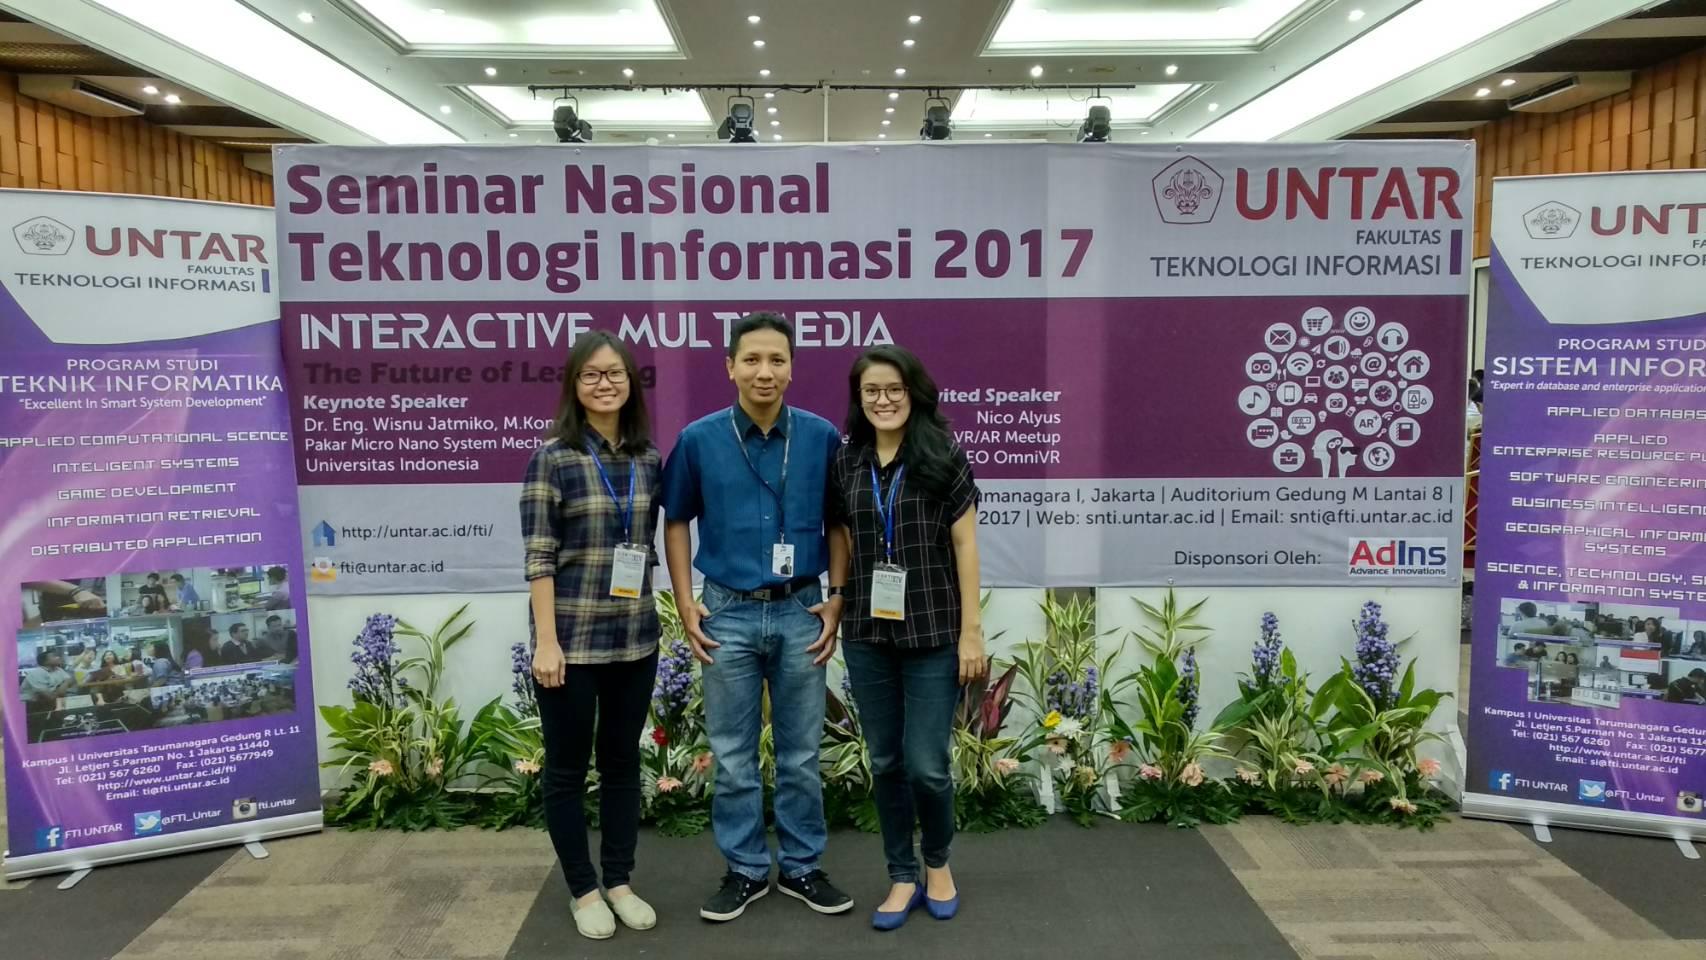 Seminar Nasional Teknologi Informasi XIV 2017